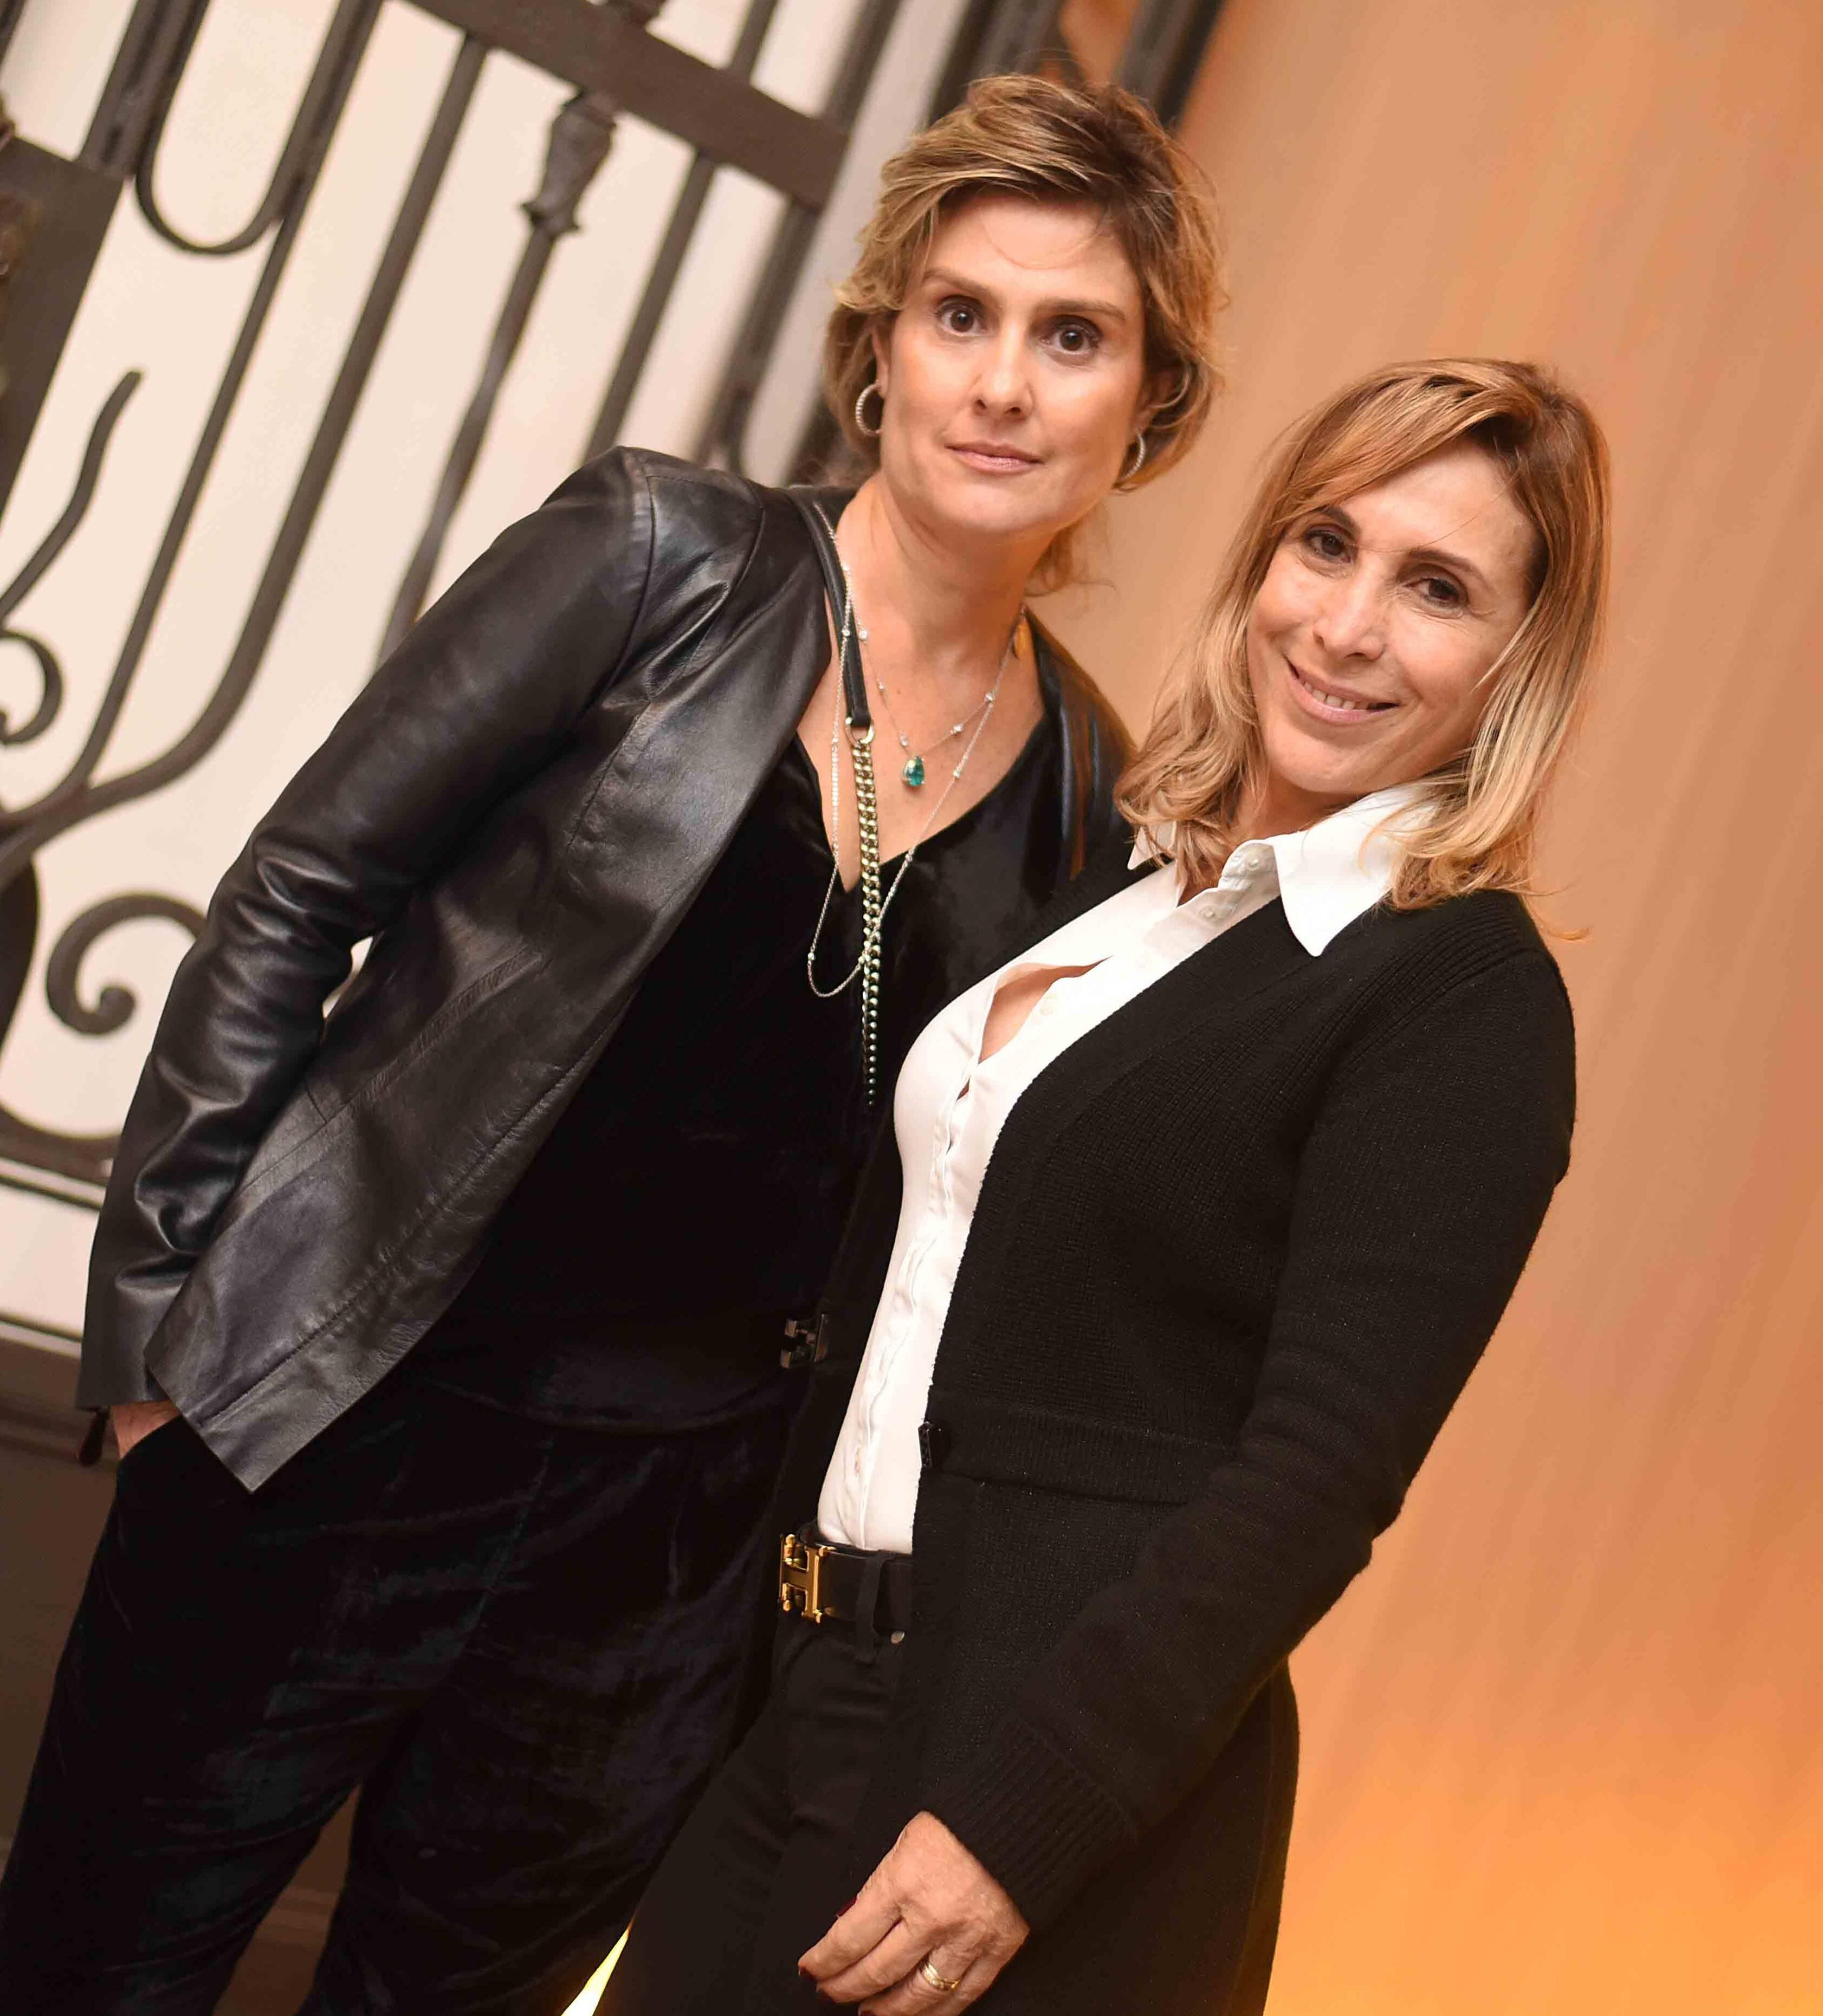 Ana Paula Carvalho e Carla Buffara  /Foto: Ari Kaye